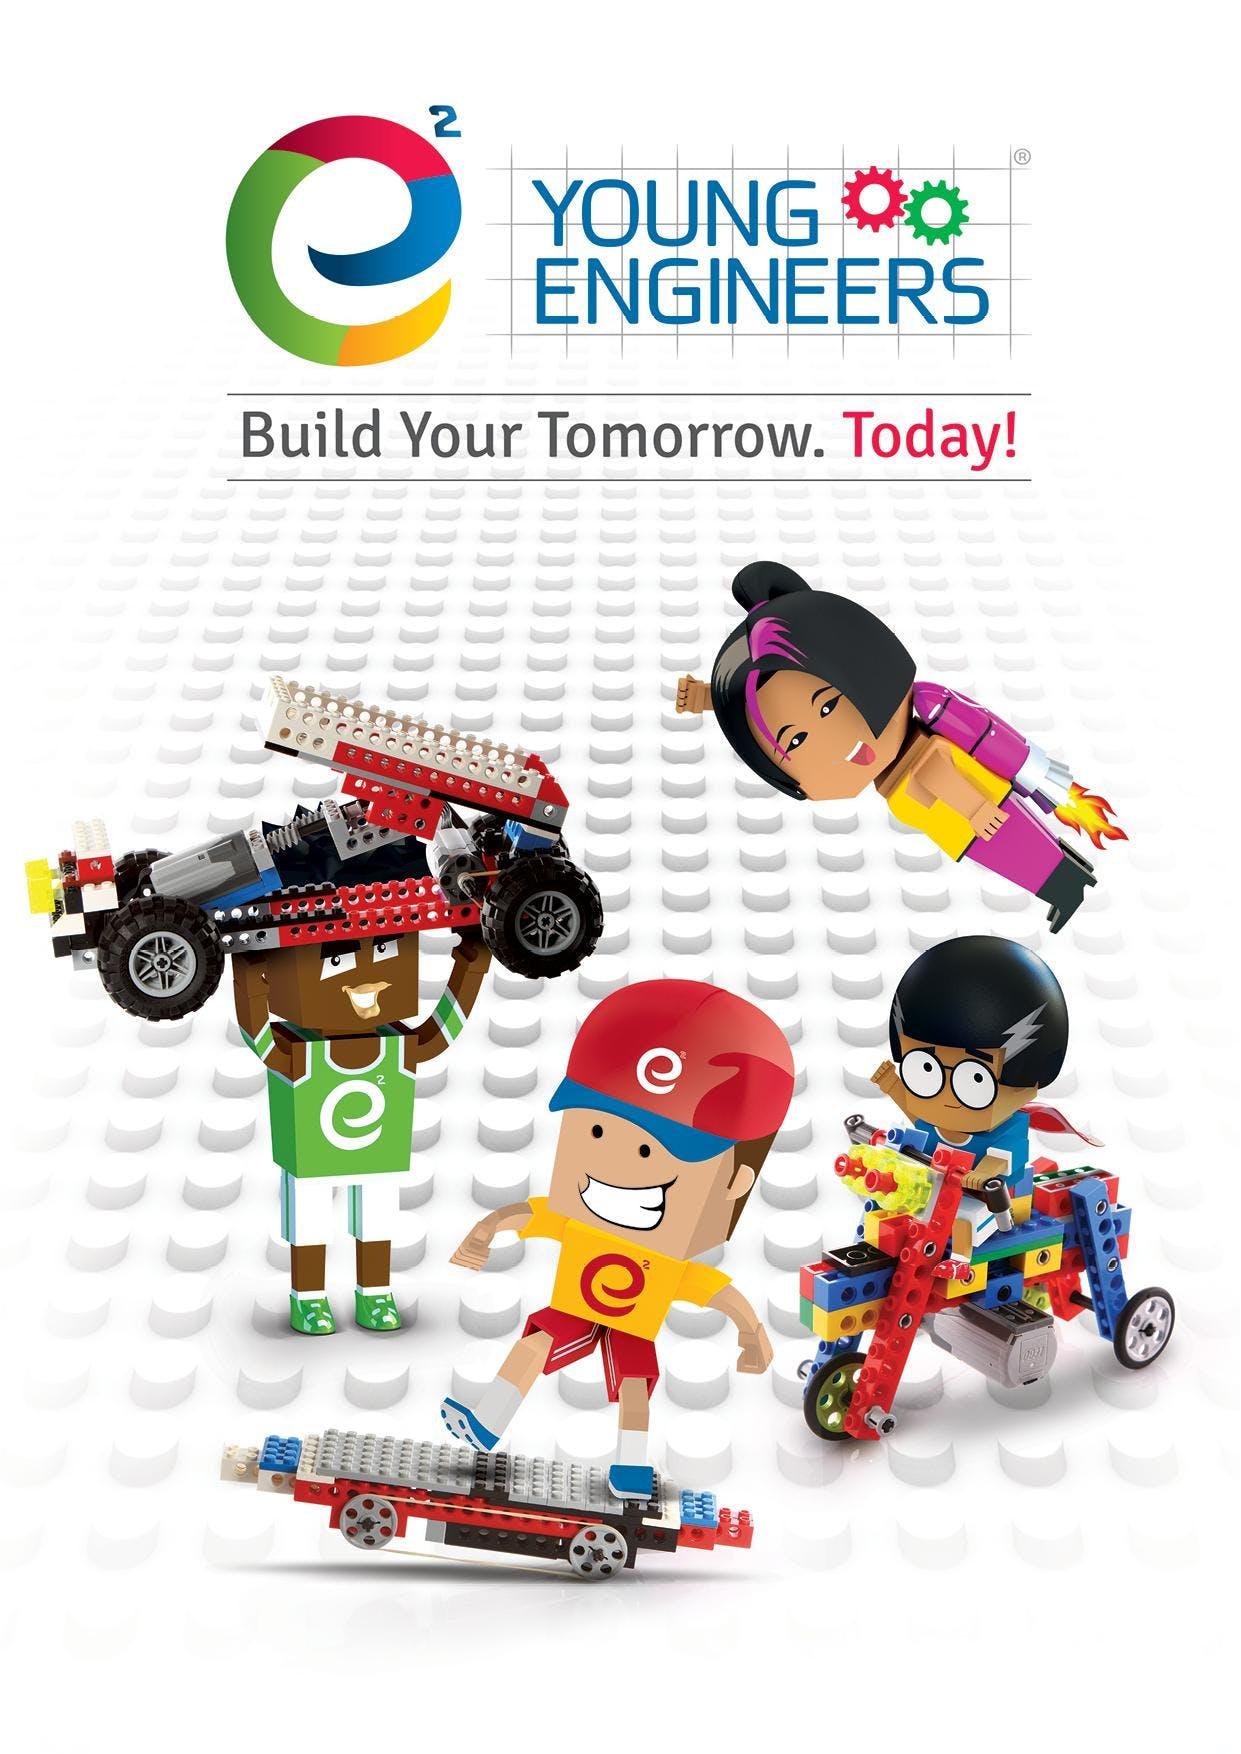 Lego Bricks Challenge - BALLSBRIDGE wk1 Summer Camp 2018 - e2 Young Engineers